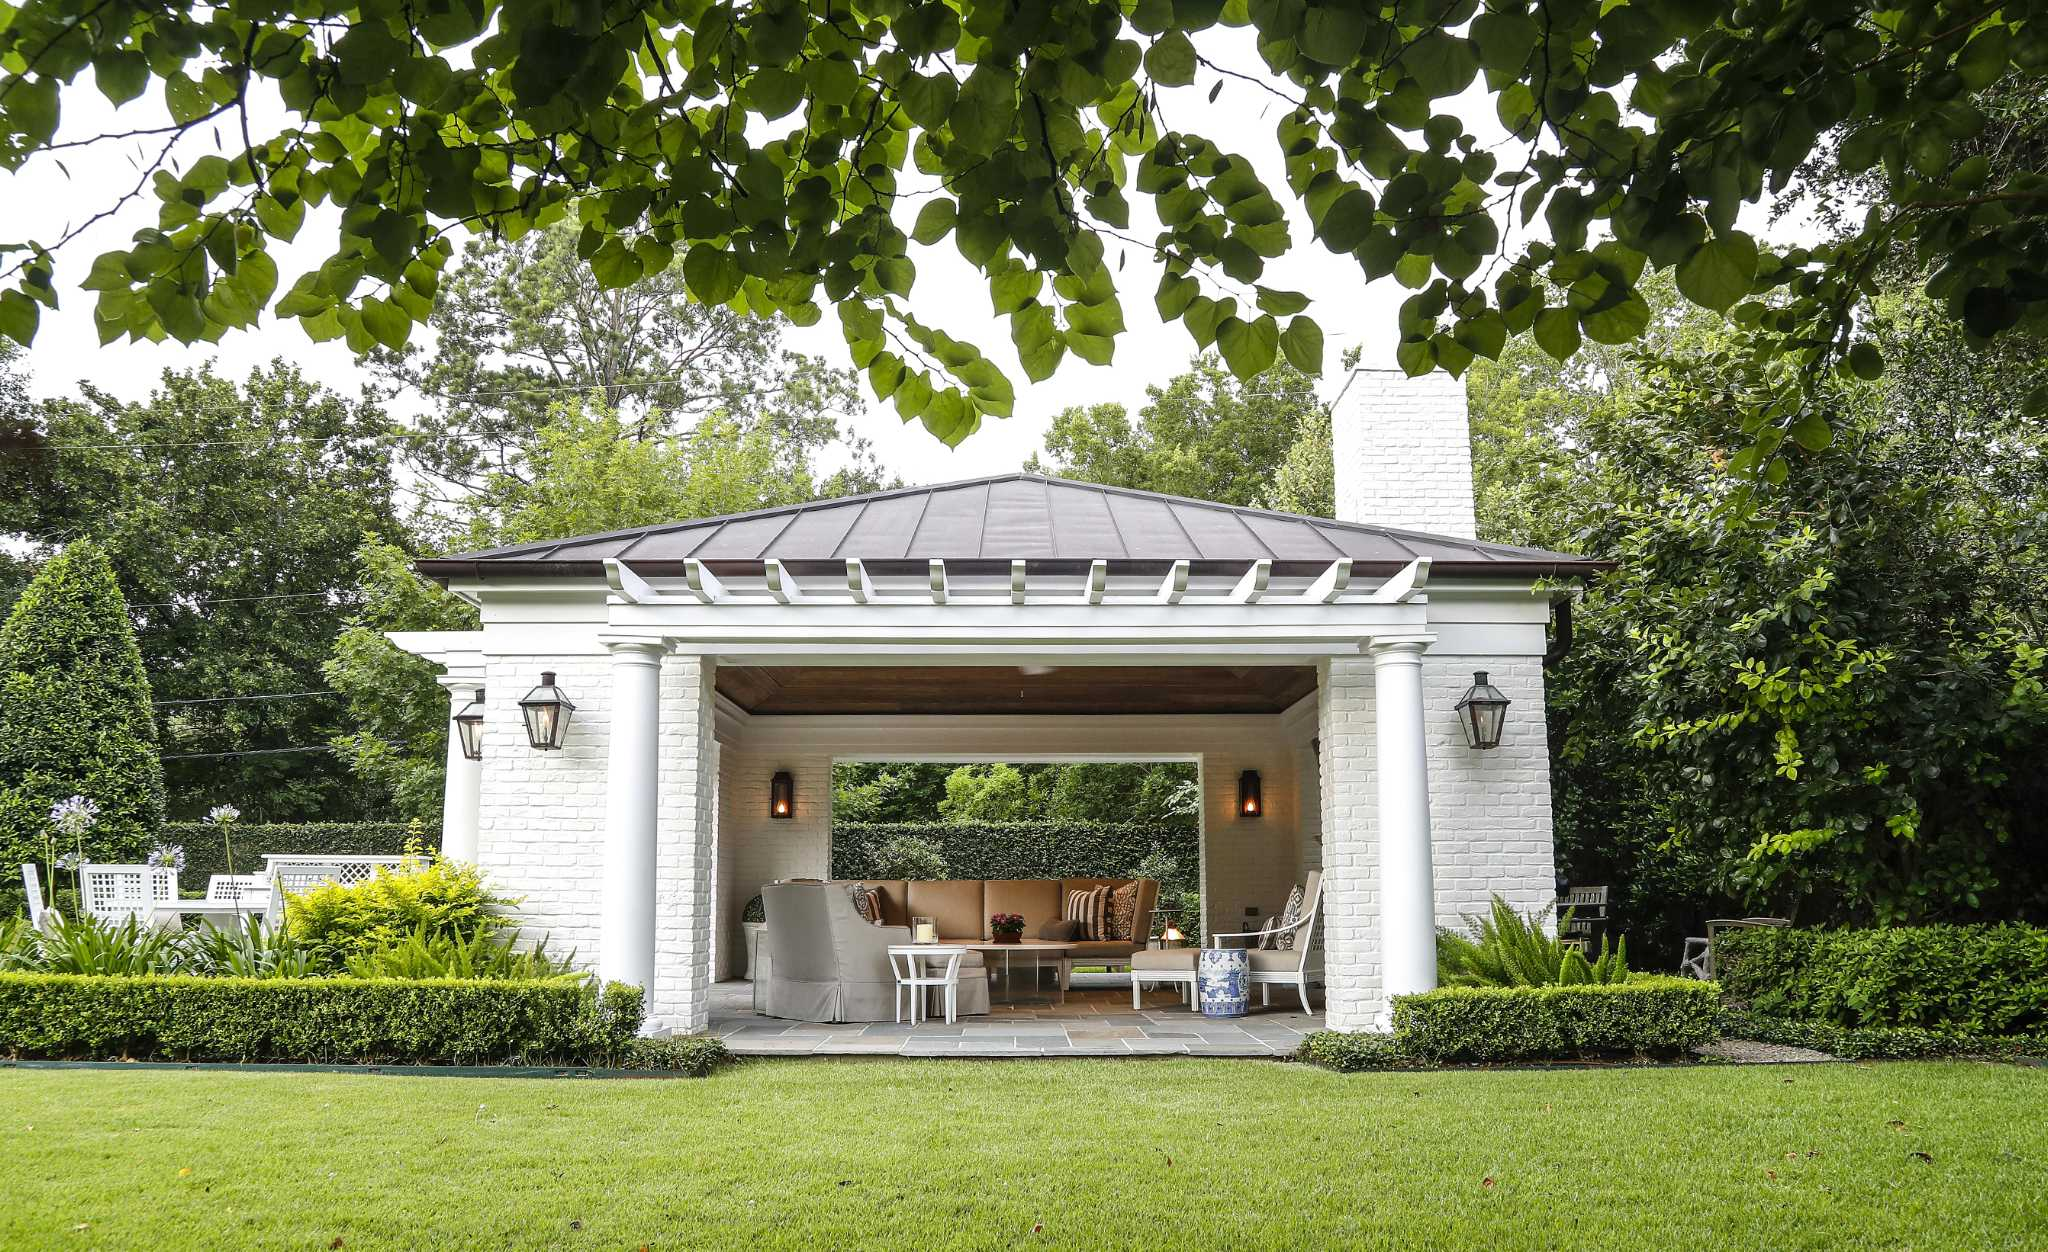 A Houston garden that's a year-round escape, even in summer